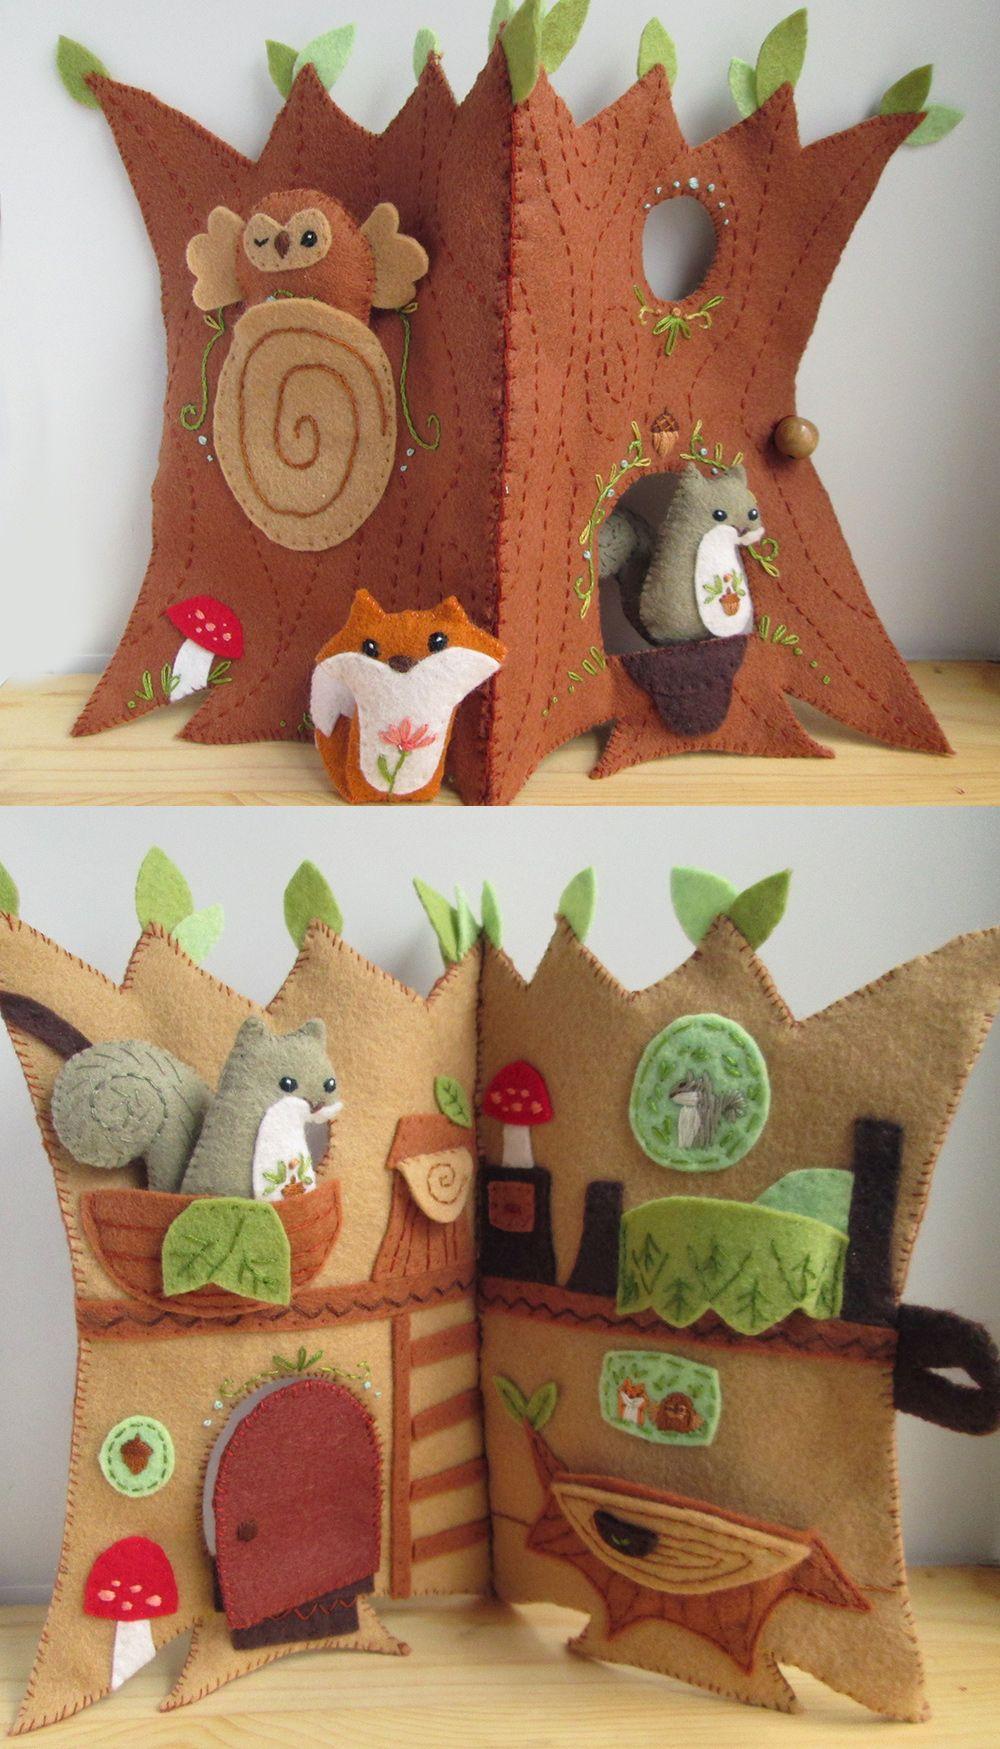 Fairy Door Quiet Book PDF Download, Plush Sewing Pattern for Fairy Garden Felt Toy